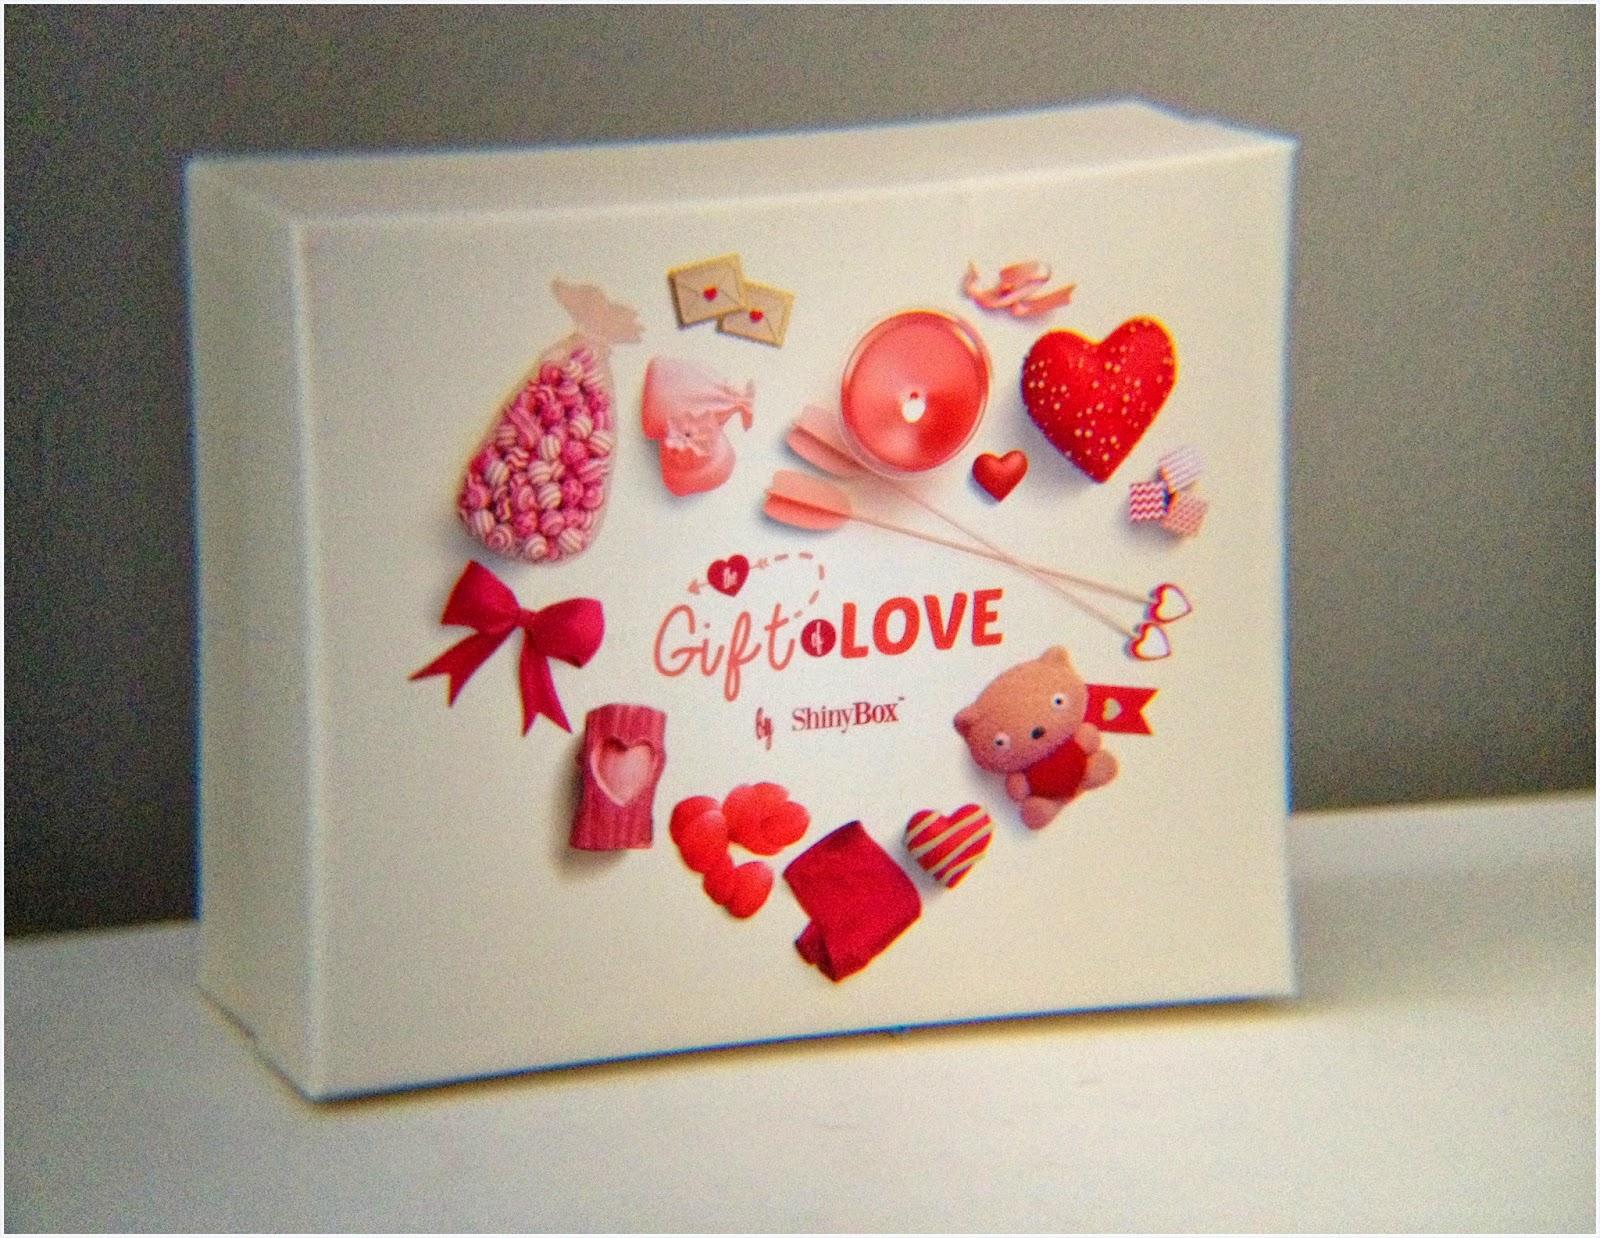 OPEN BOX : SHINYBOX, GIFT OF LOVE / FEBRUARY